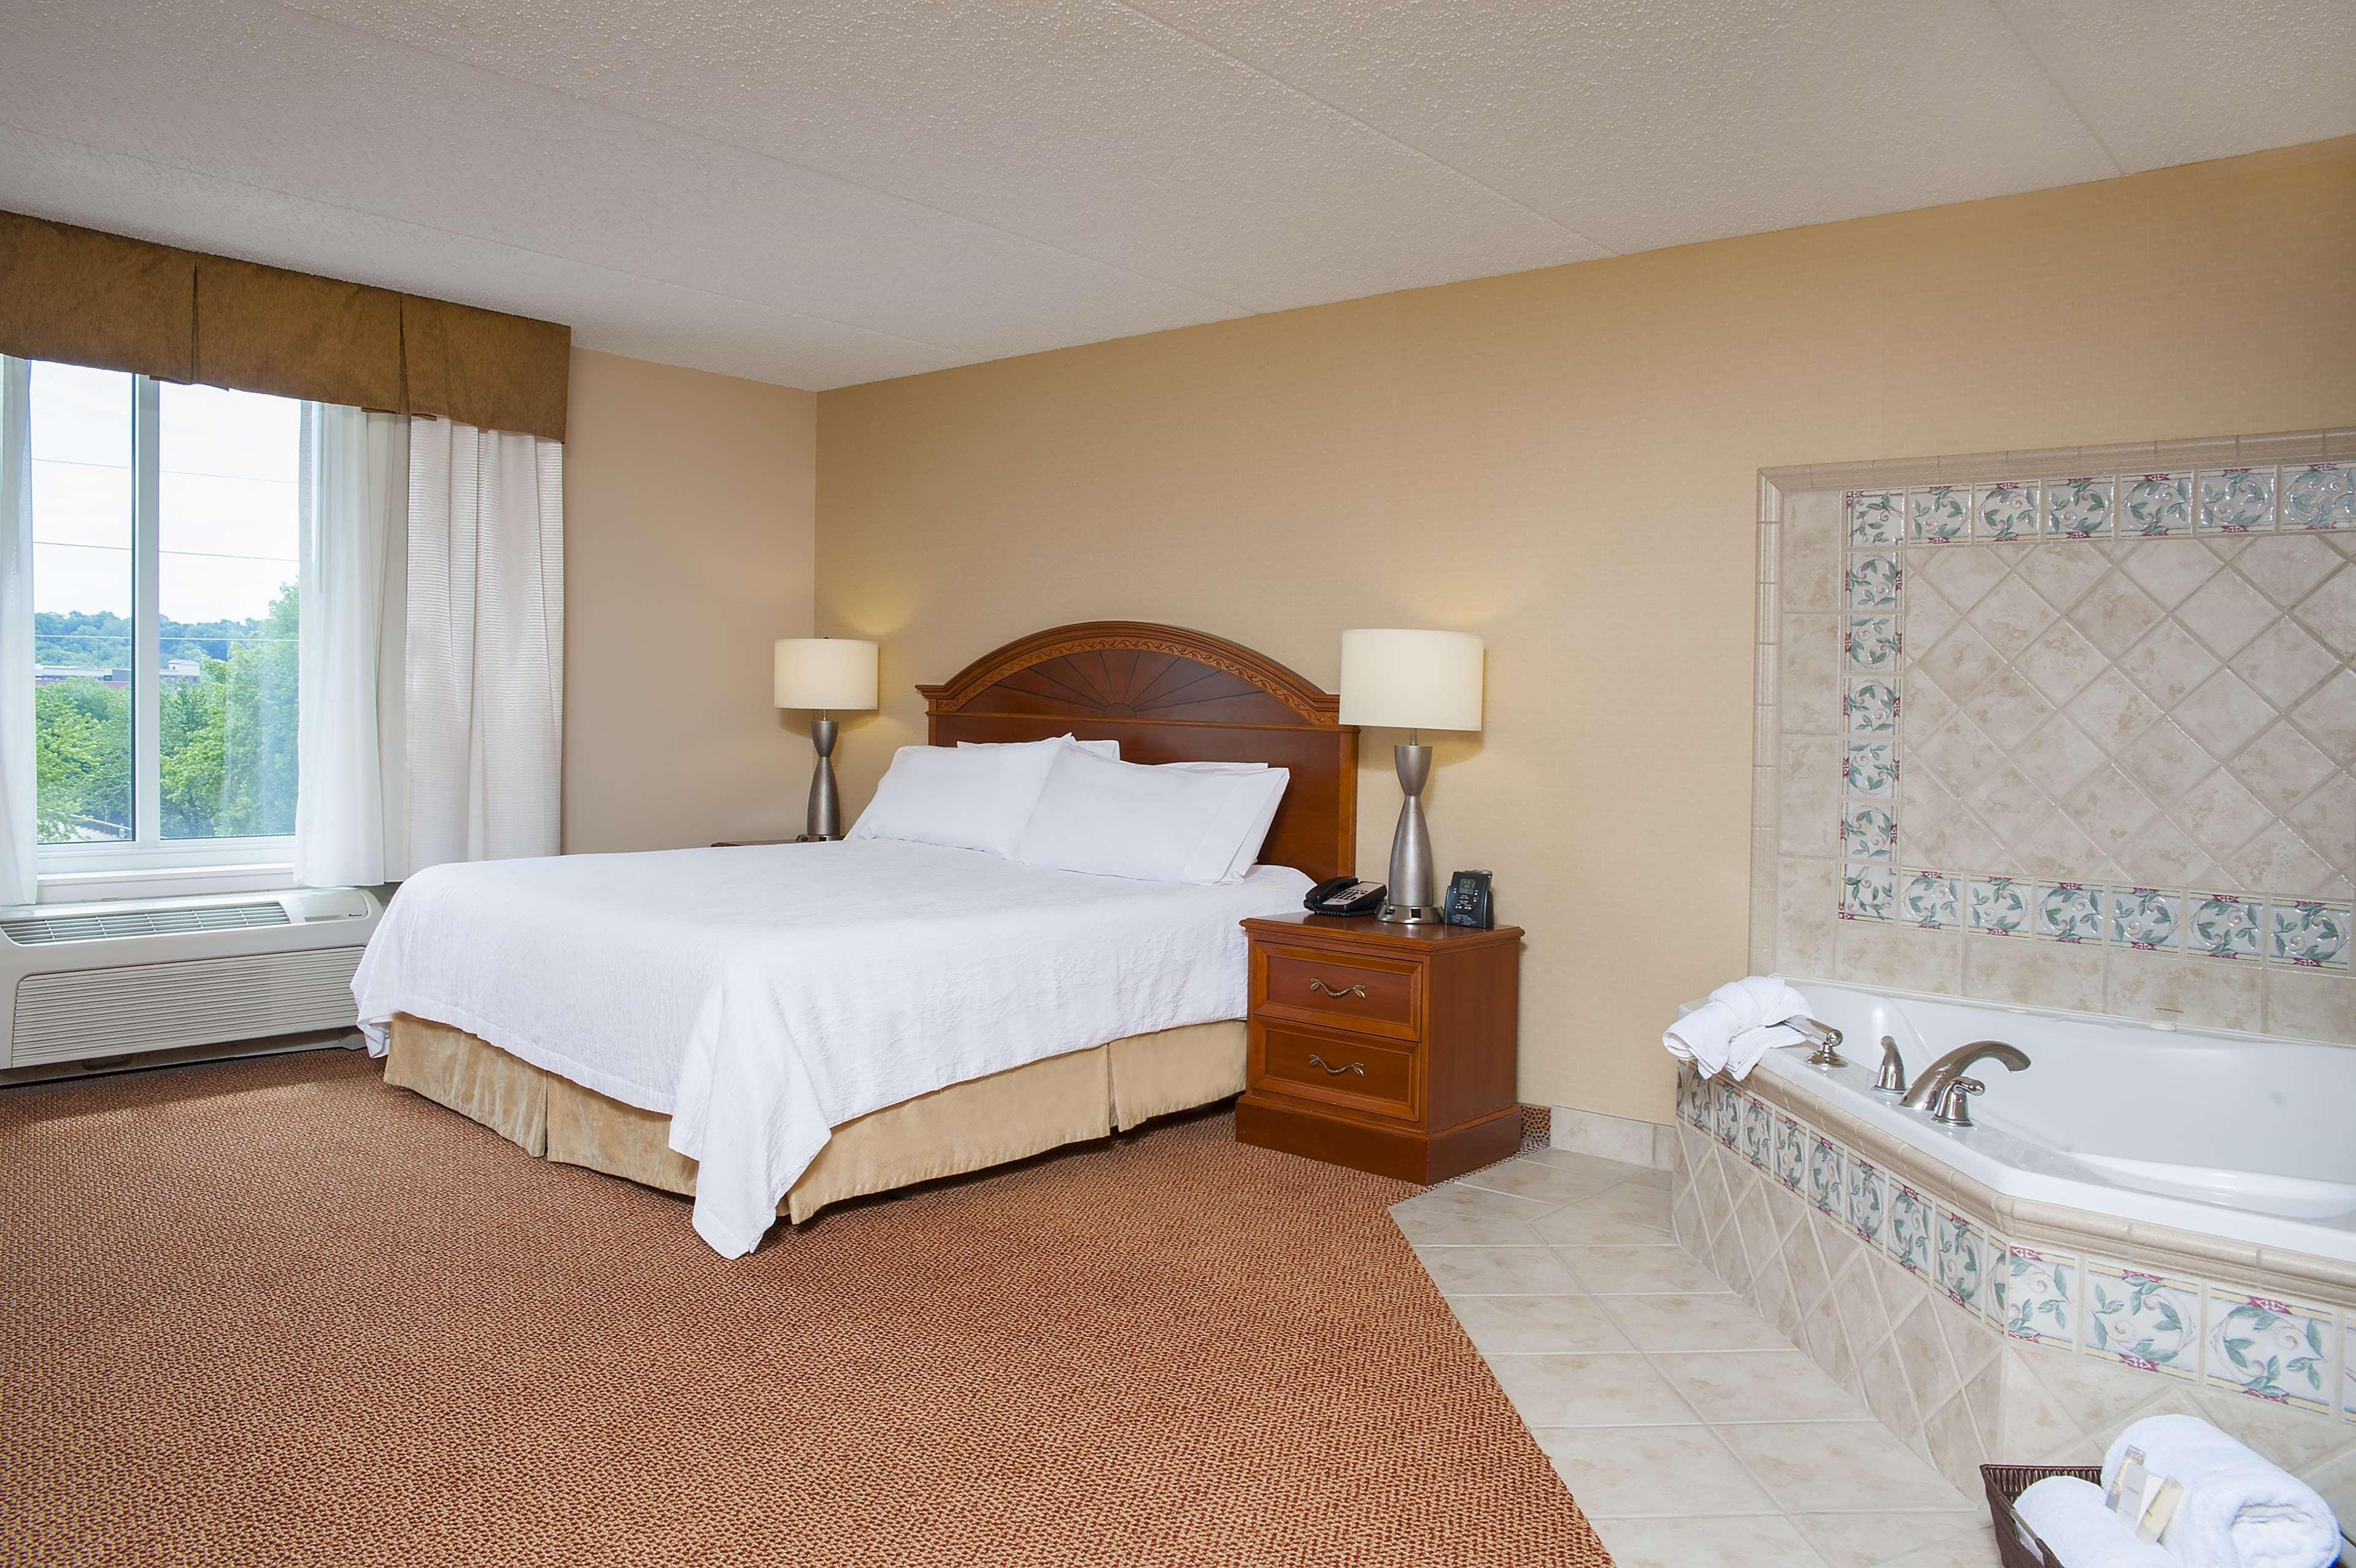 Hilton Garden Inn West Lafayette Wabash Landing image 35